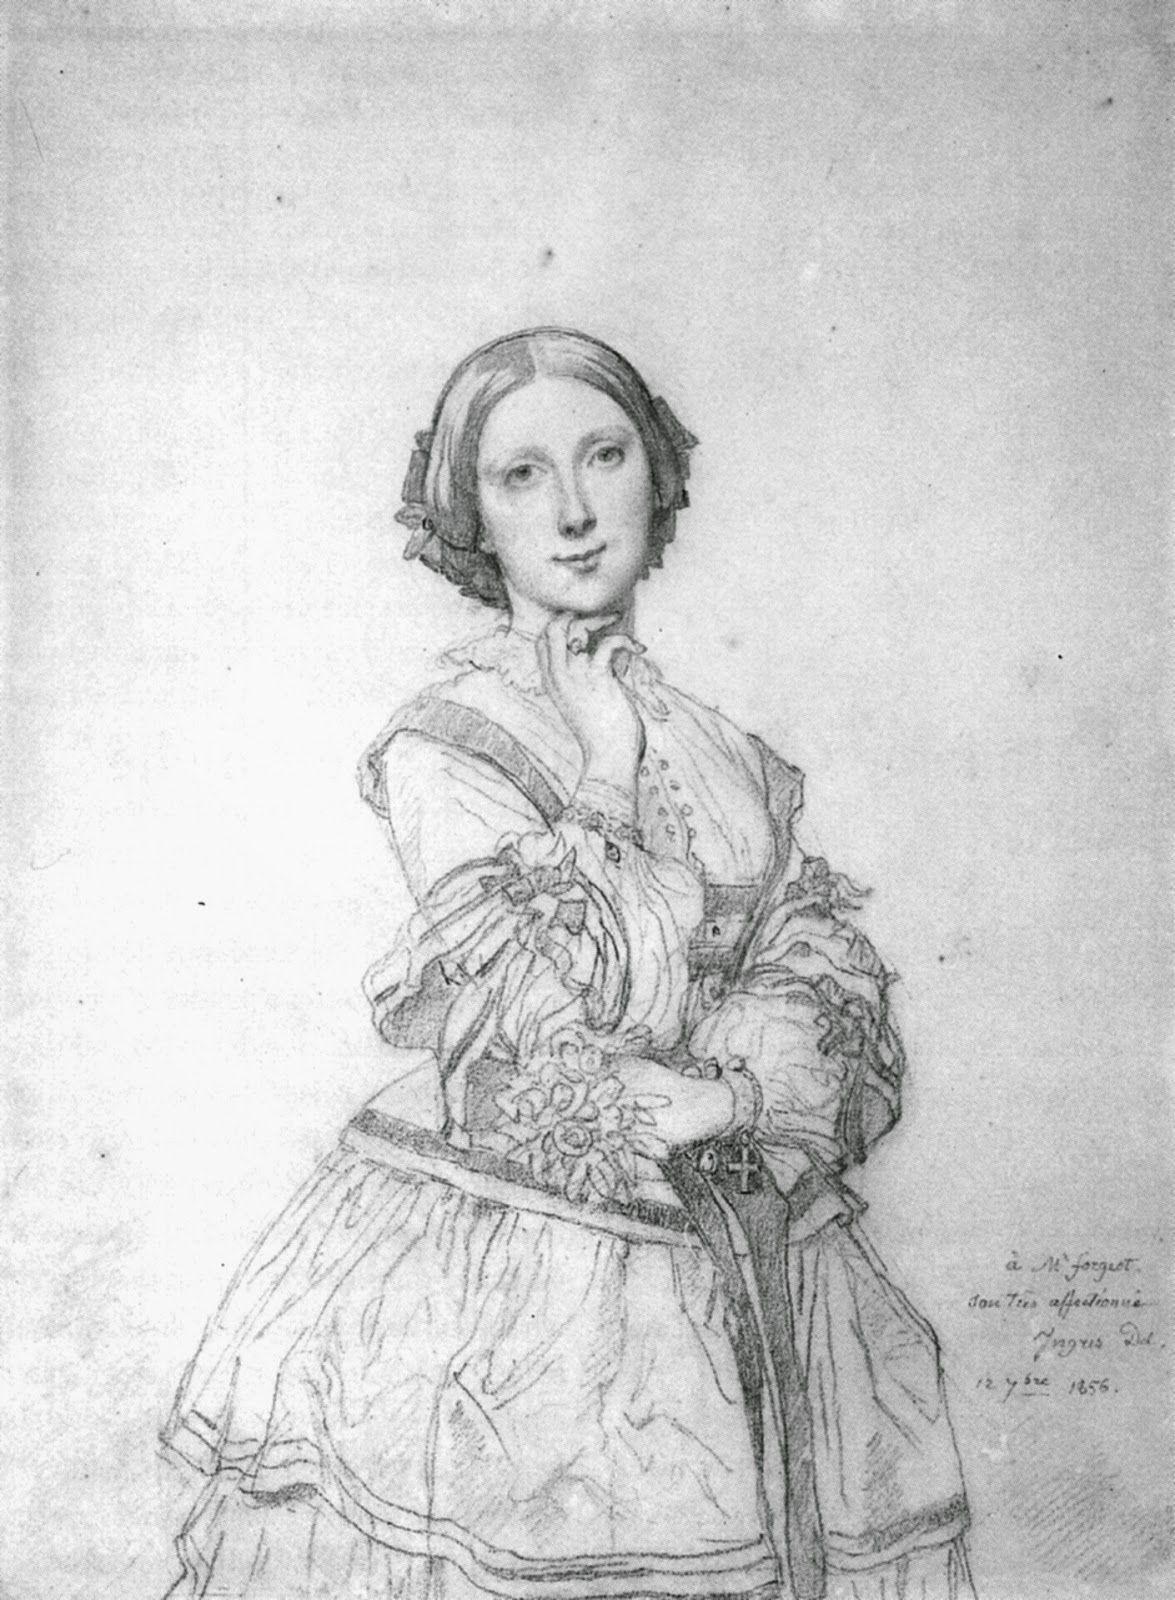 mademoiselle ceceile panckoucke ingres 1856